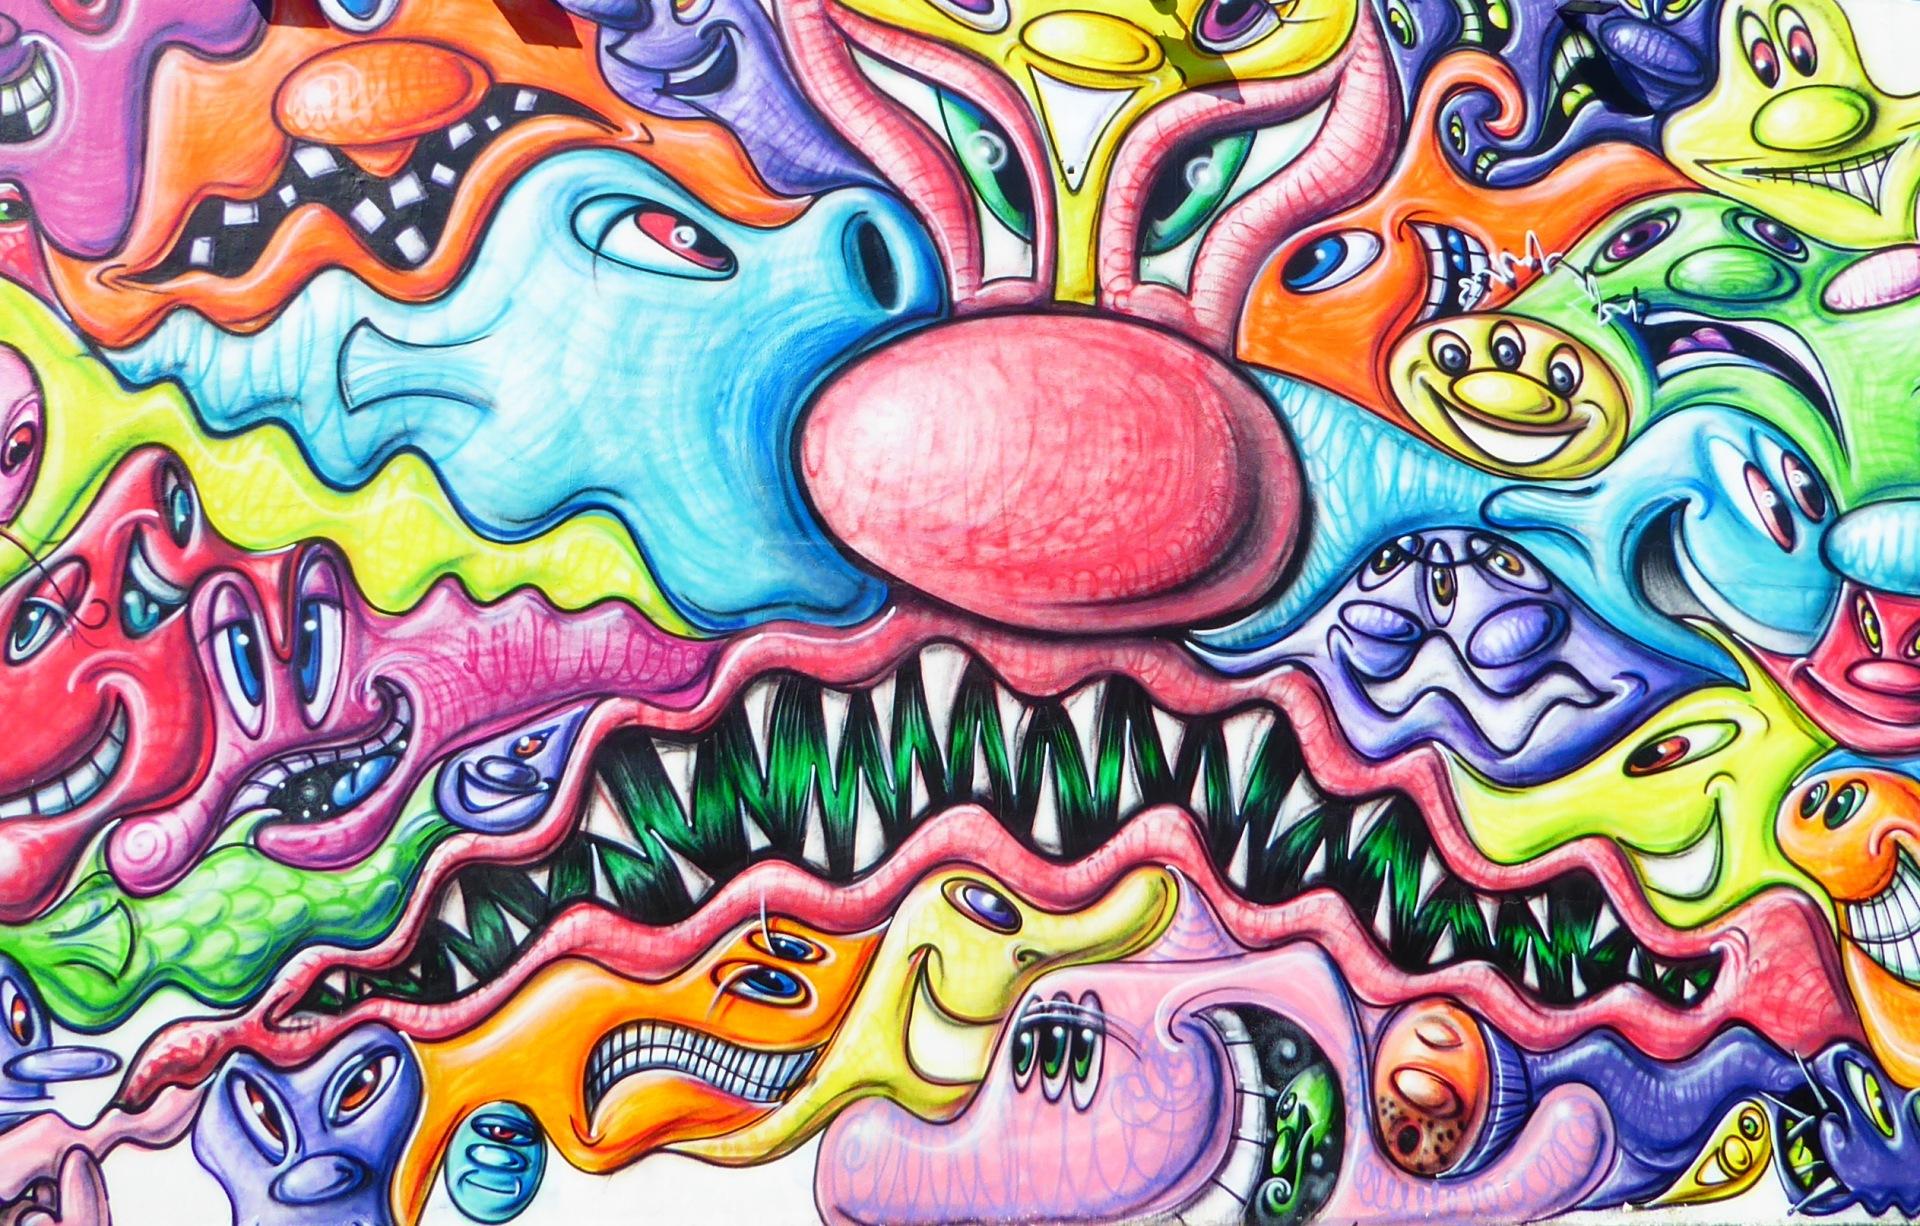 wynwood walls miami florida street art colourful